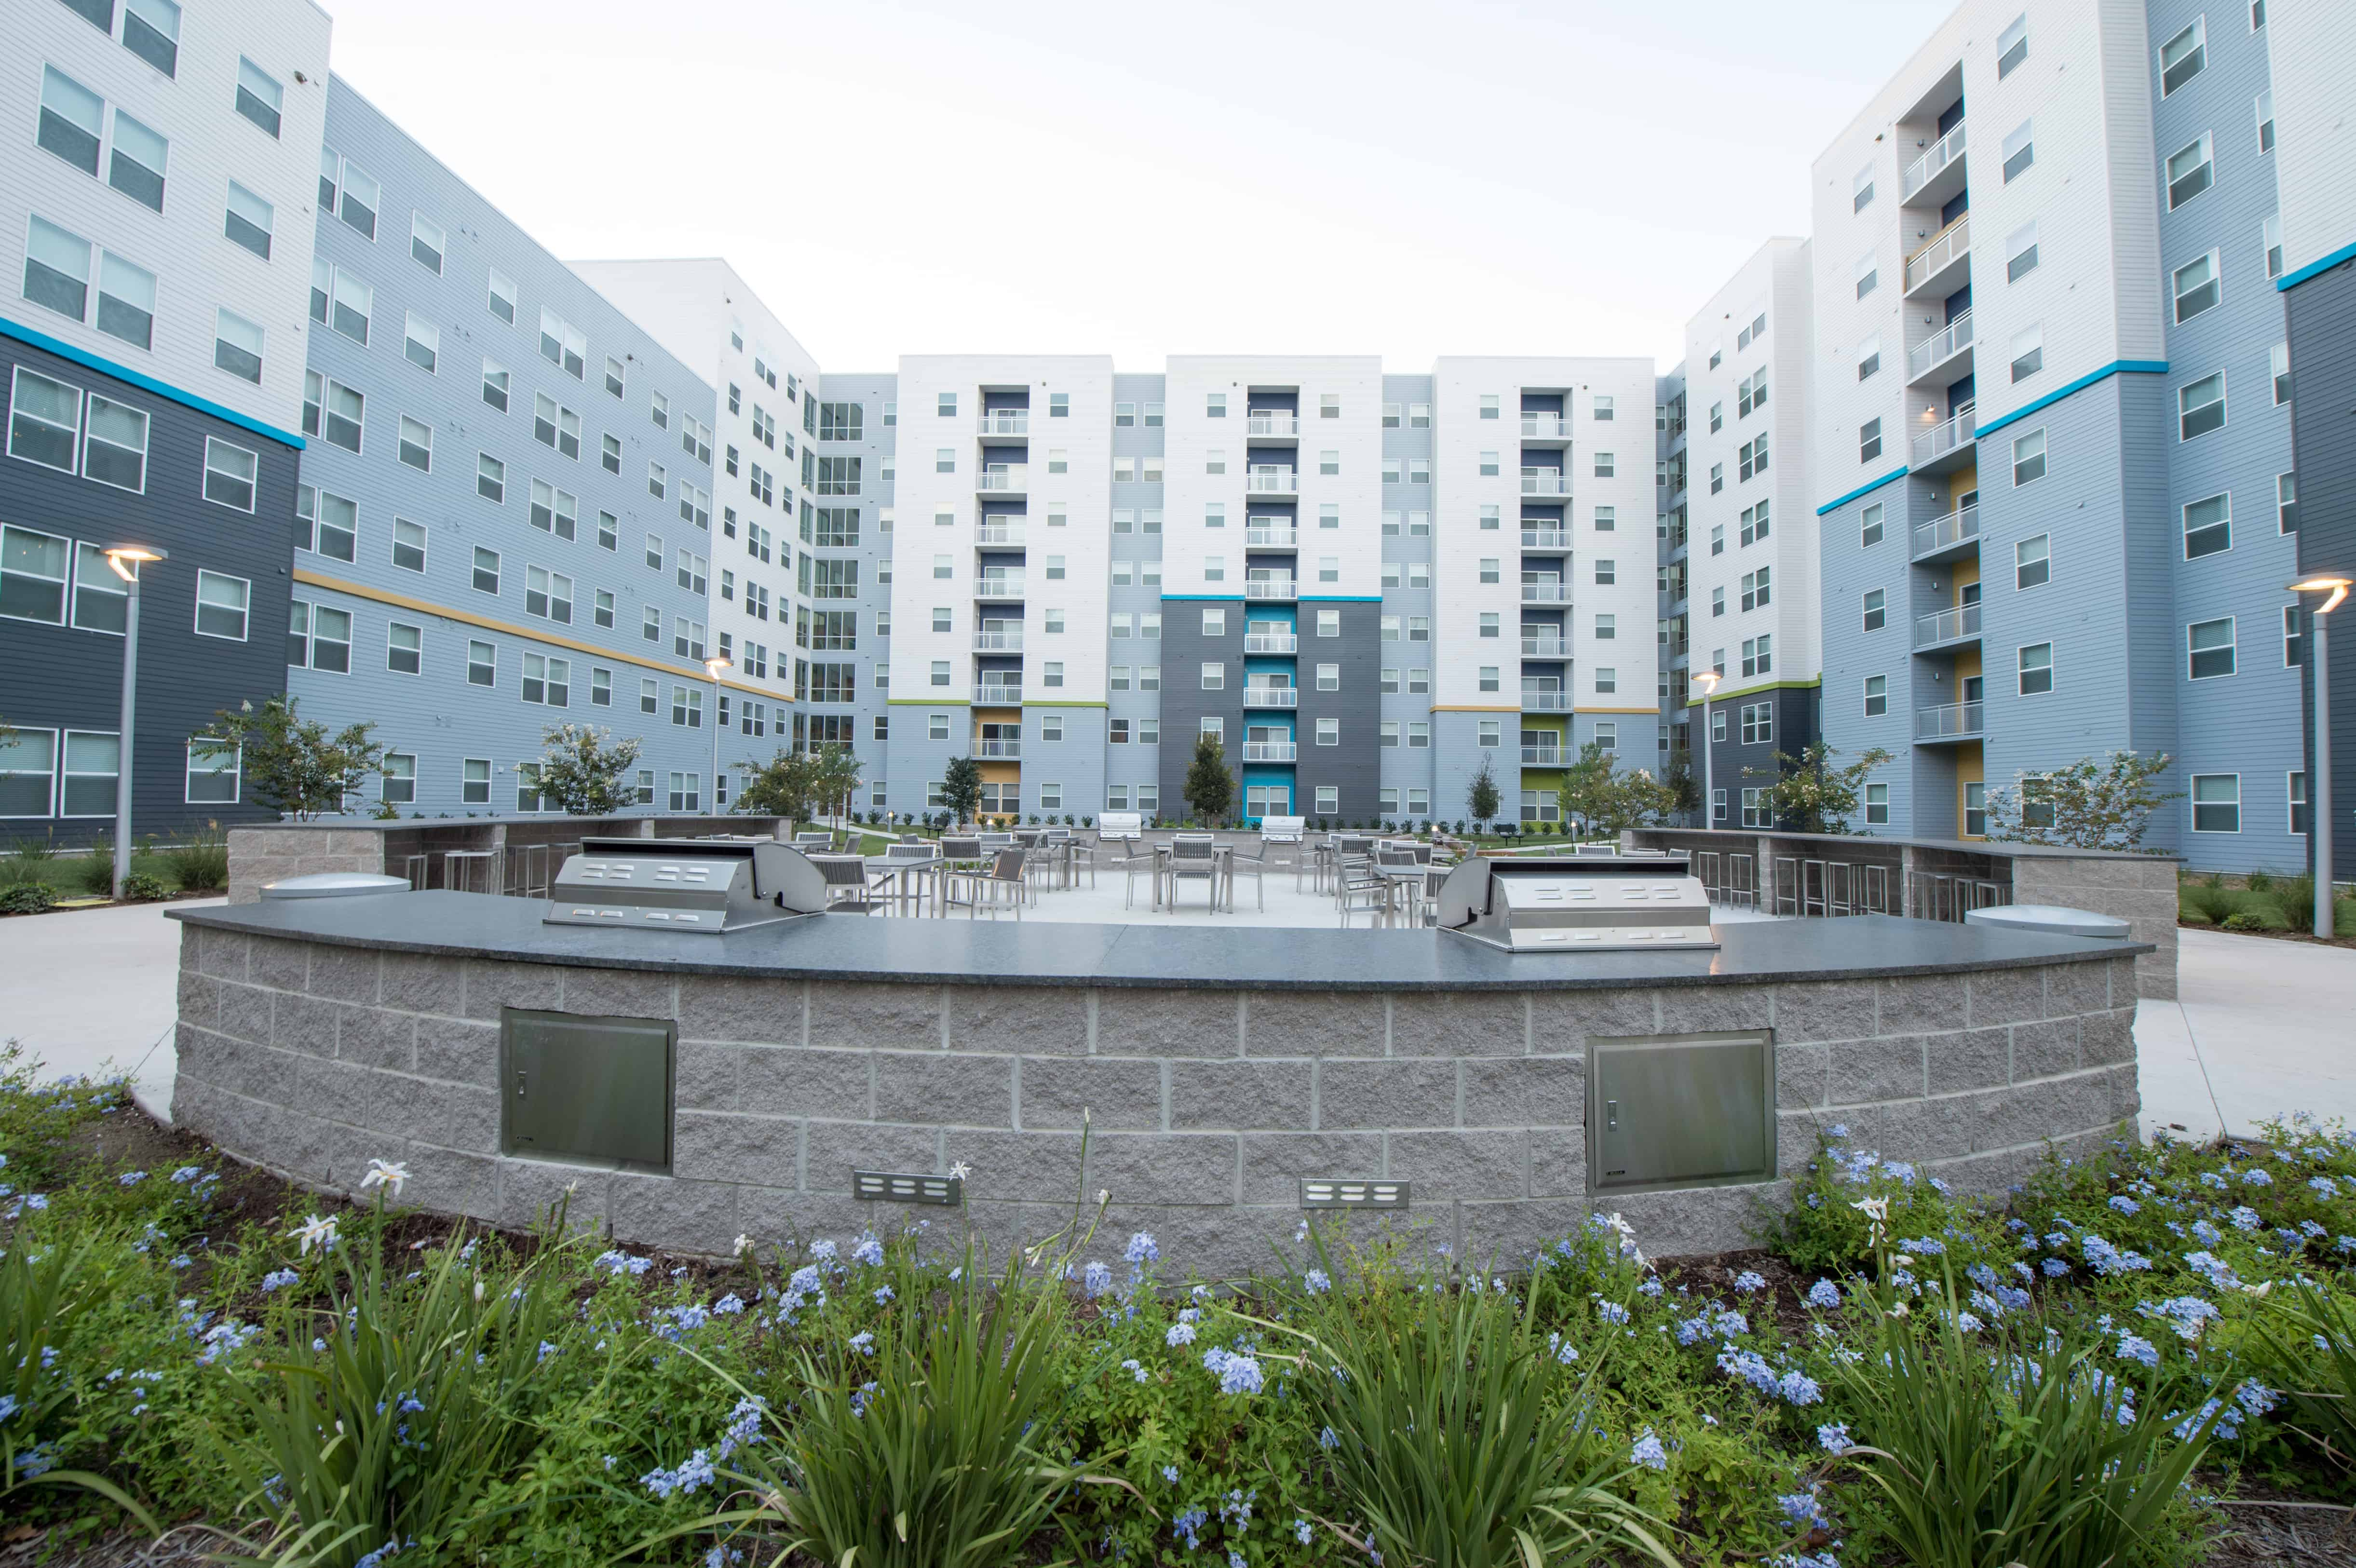 Park West Apartments College Station Tx